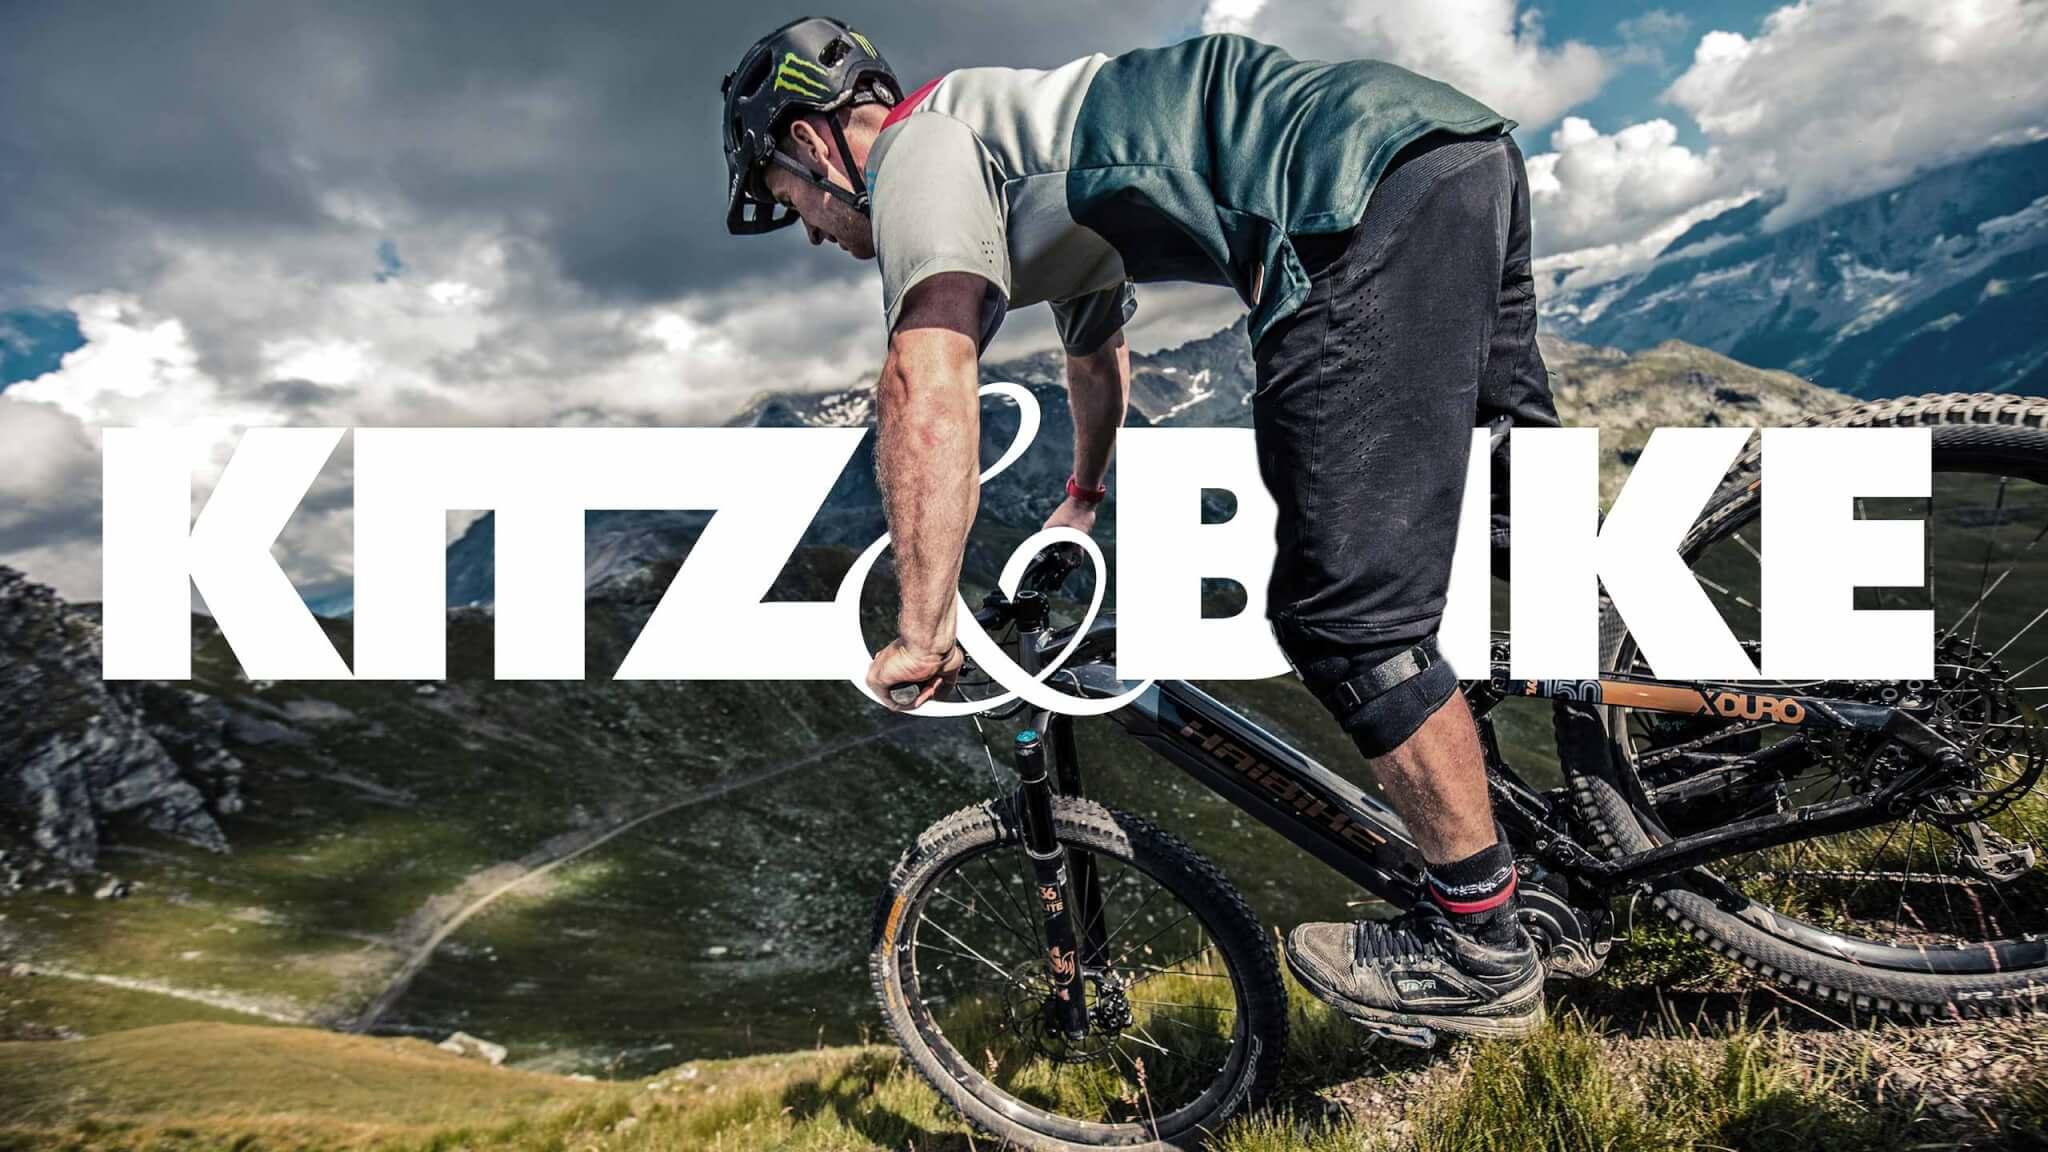 Kitzsport Kitz&Bike Kitzbühel